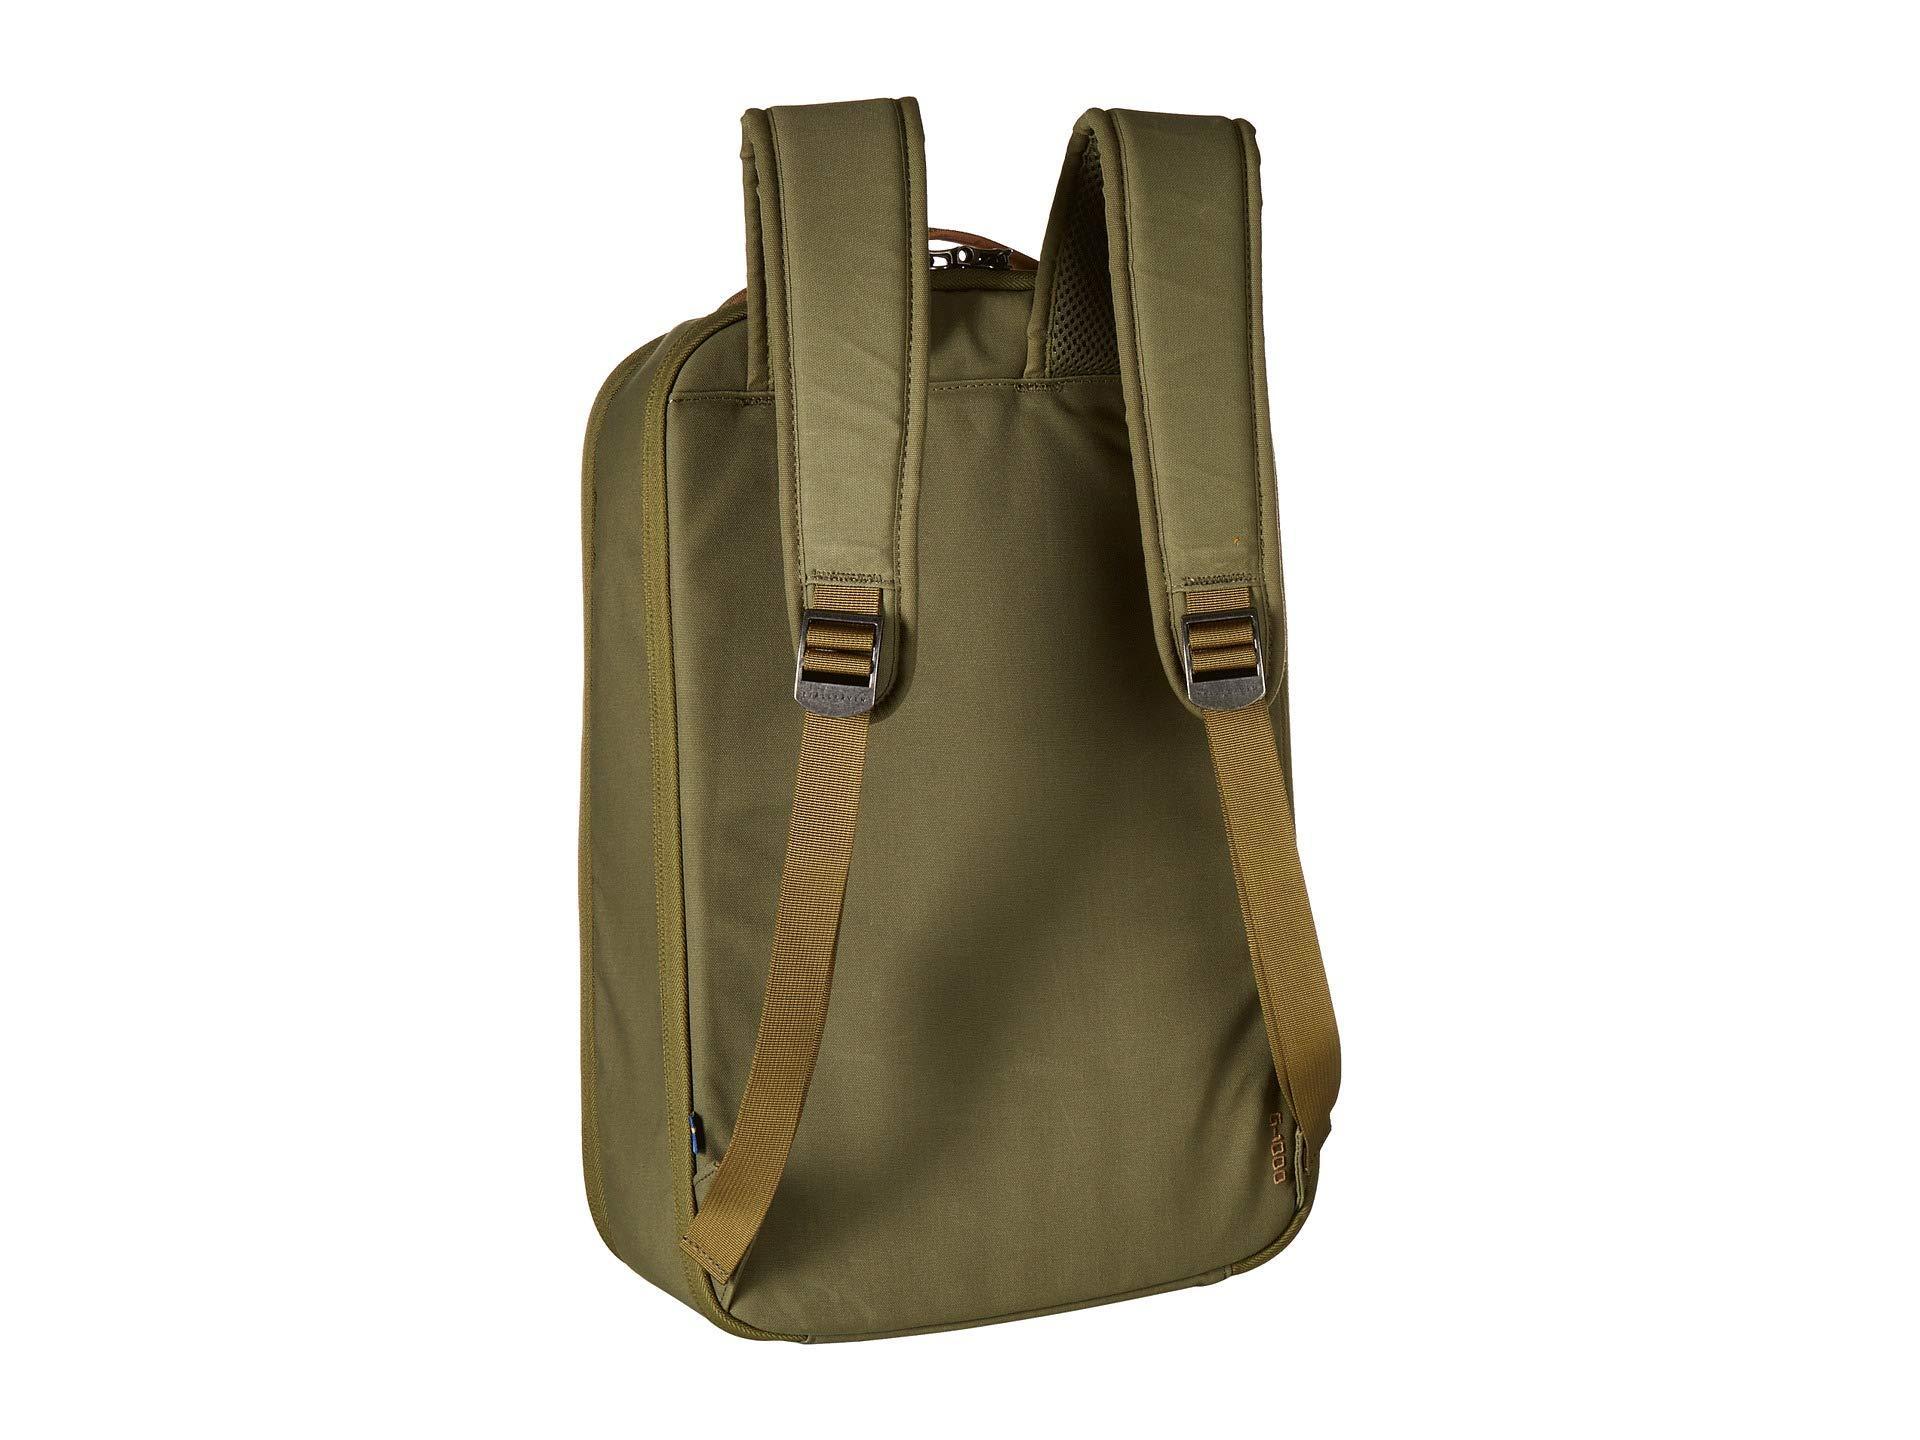 a6dda1d21ef8 Fjallraven - Green Travel Pack Small (black) Backpack Bags for Men - Lyst.  View fullscreen